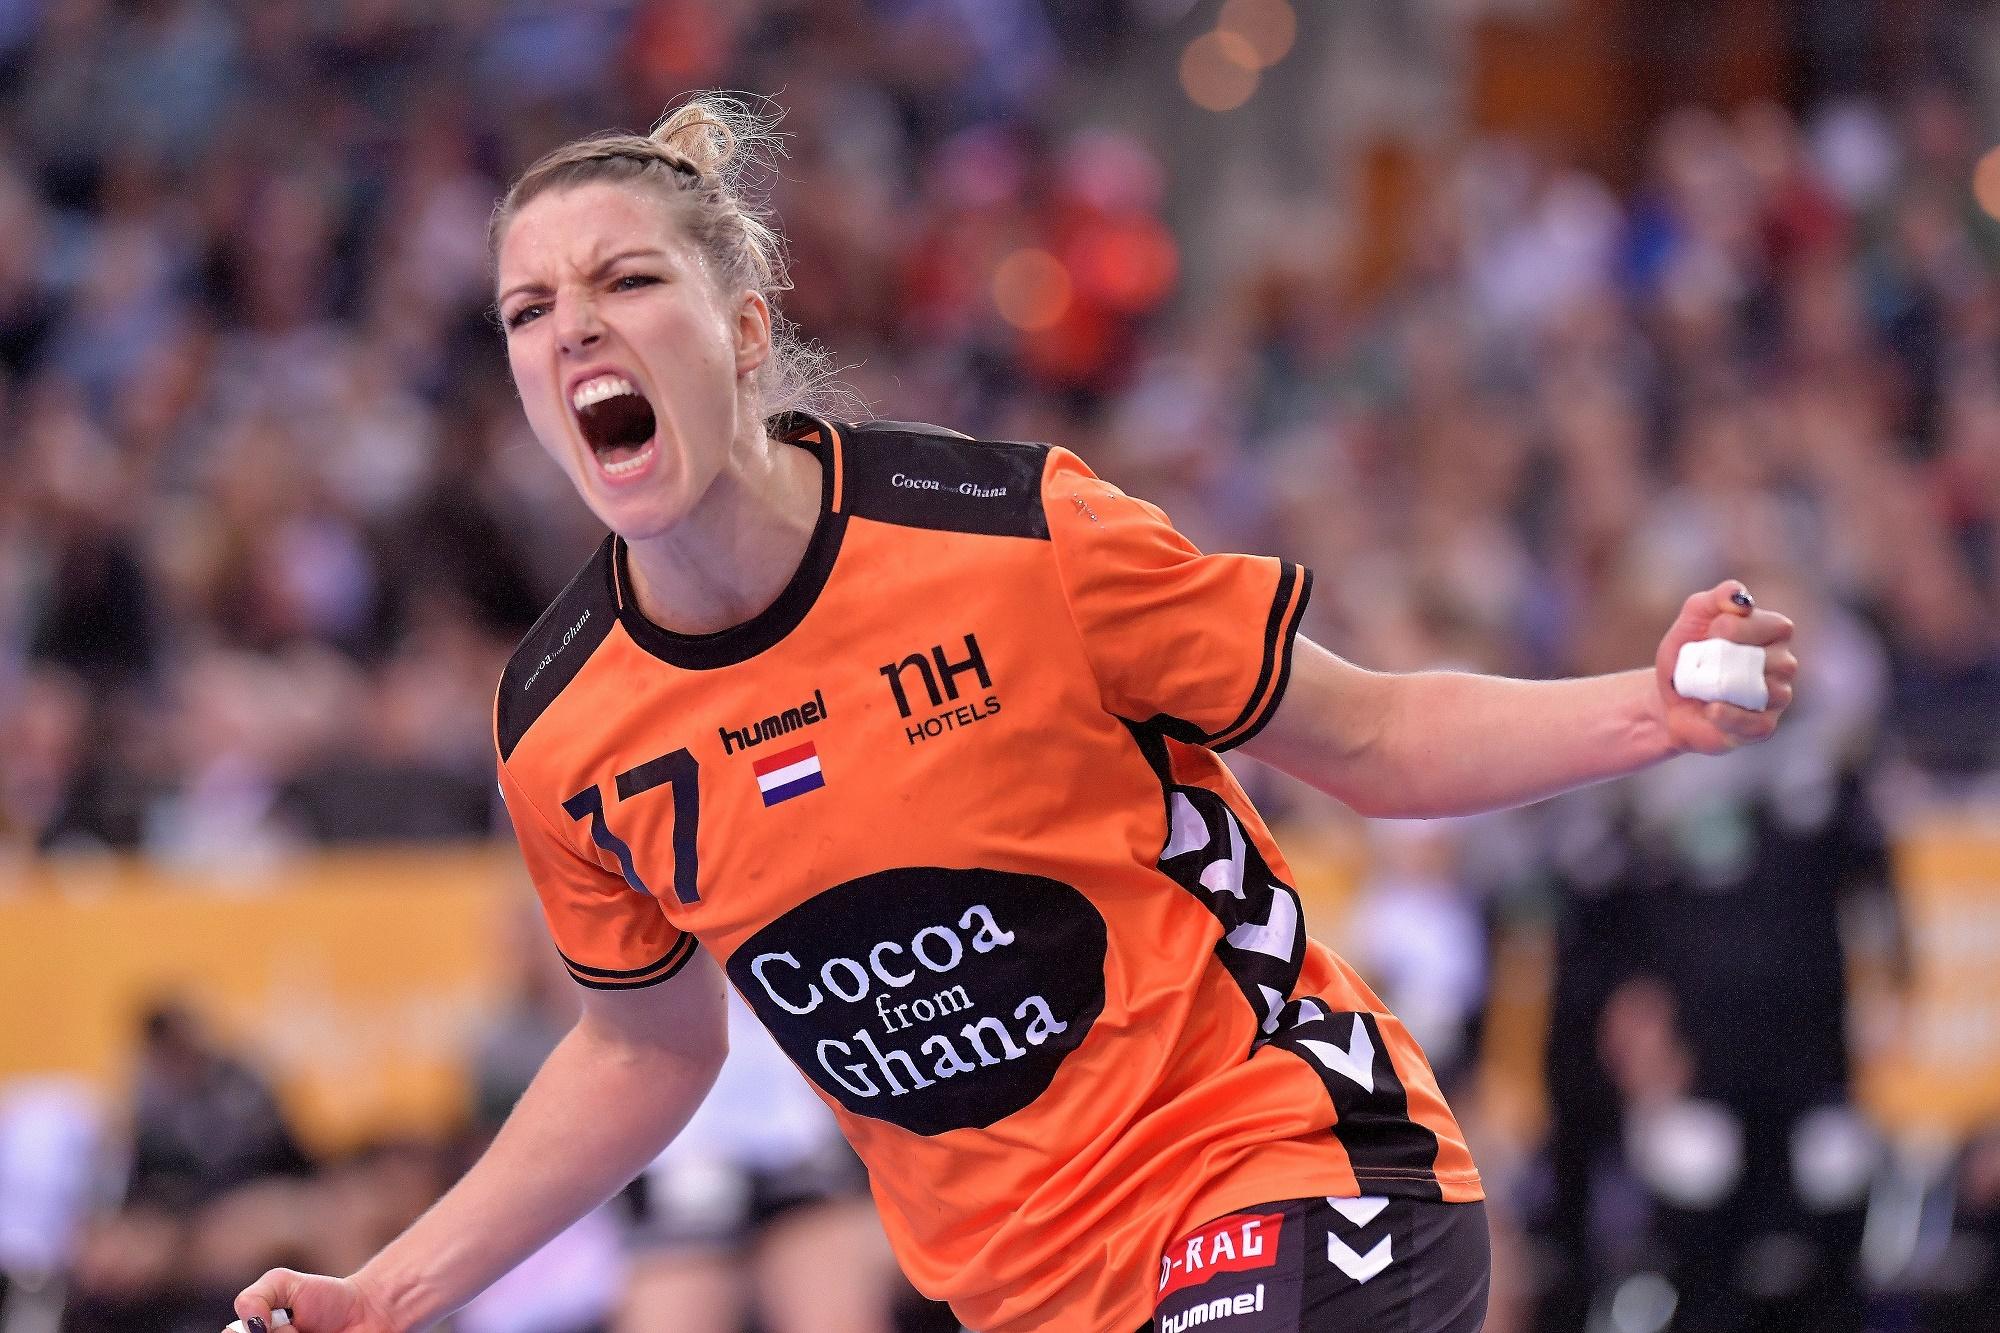 8-12-2017 HANDBAL:NEDERLAND-DUITSLAND:LEIPZIG WK Handbal Dames 2017 Nederland - Duitsland  Nycke Groot #17 NED  Foto: Henk Seppen